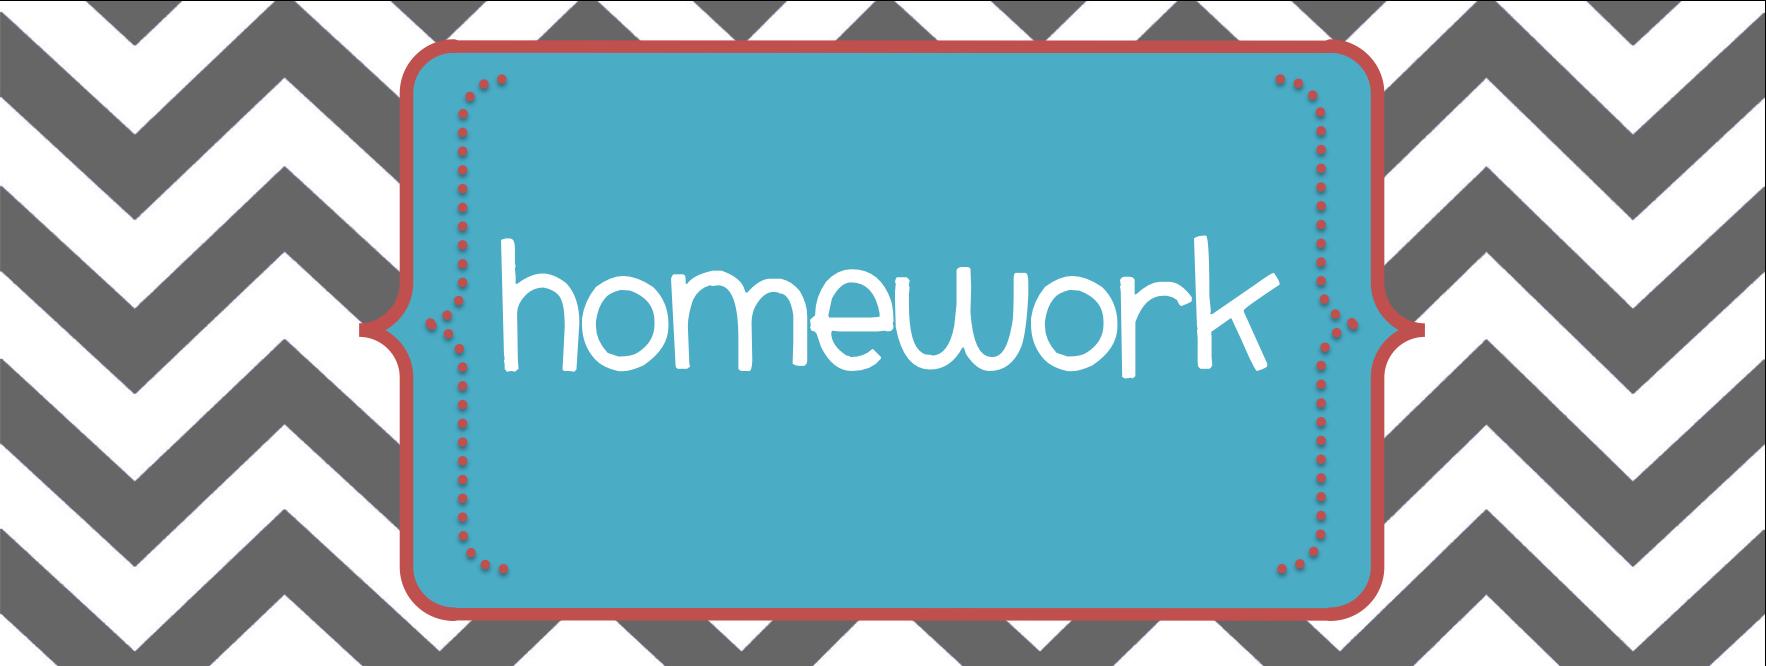 Online homework help canada